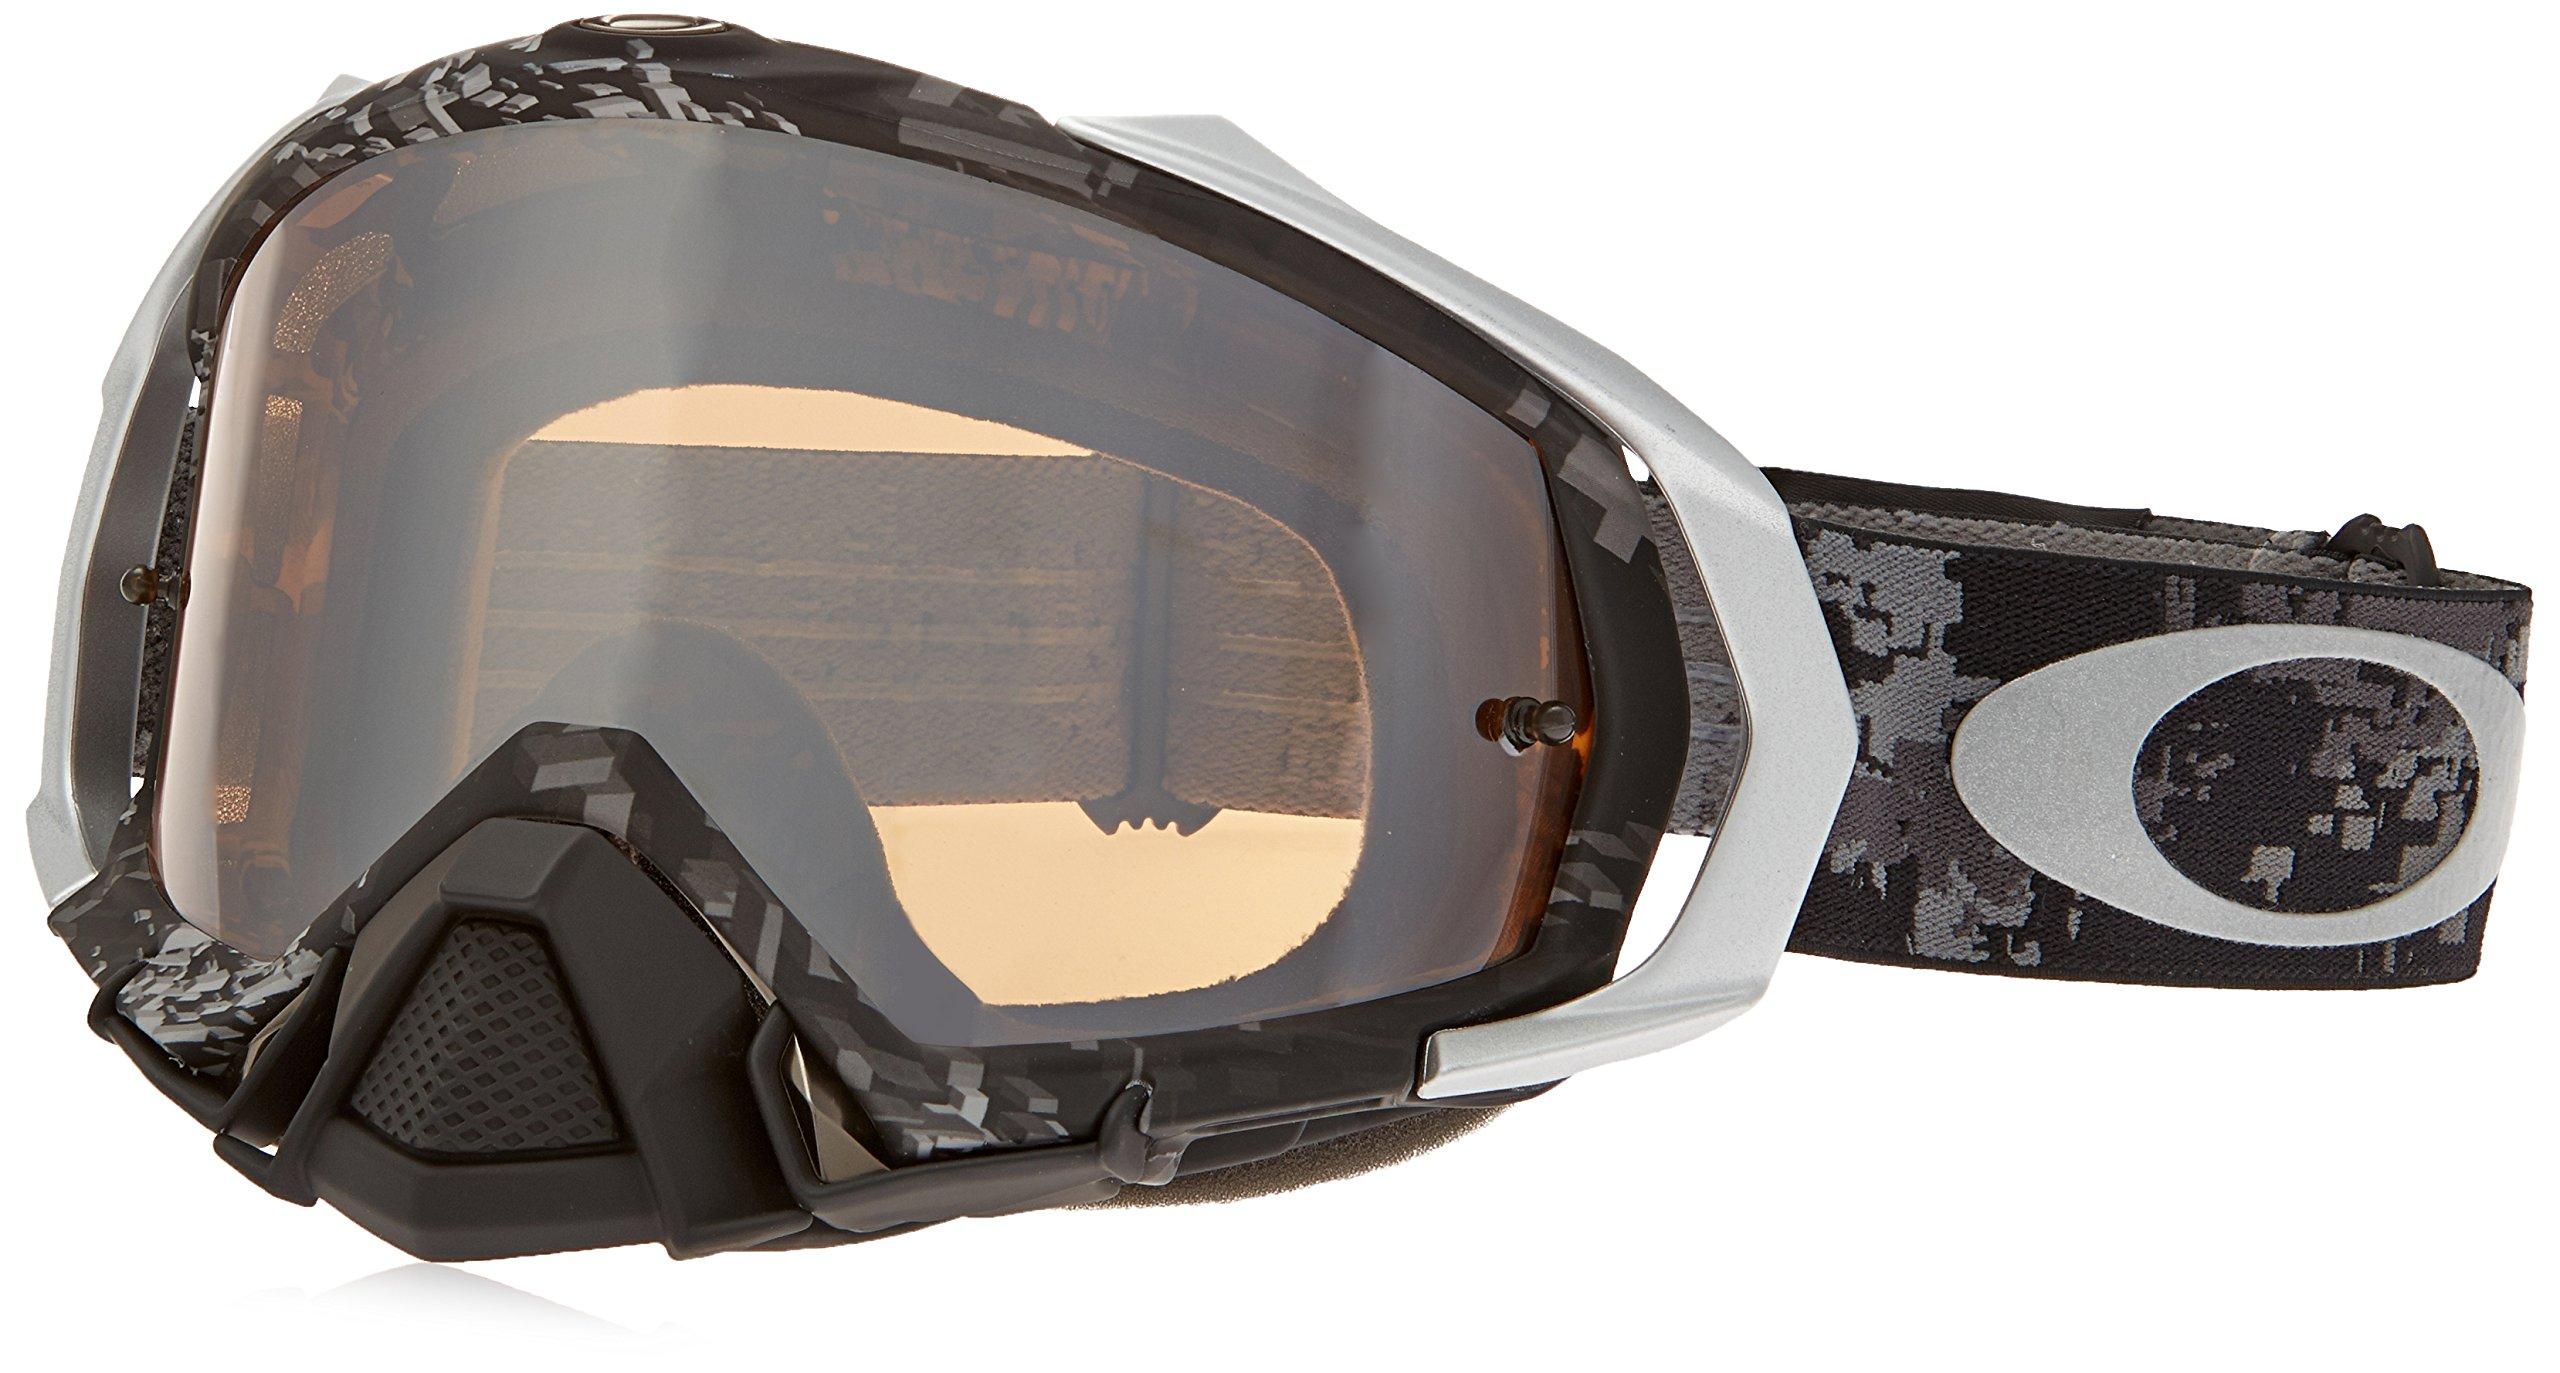 Oakley Mayhem MX Men's Goggles (Stewart Stealth Camo Frame/Black Iridium Lens)